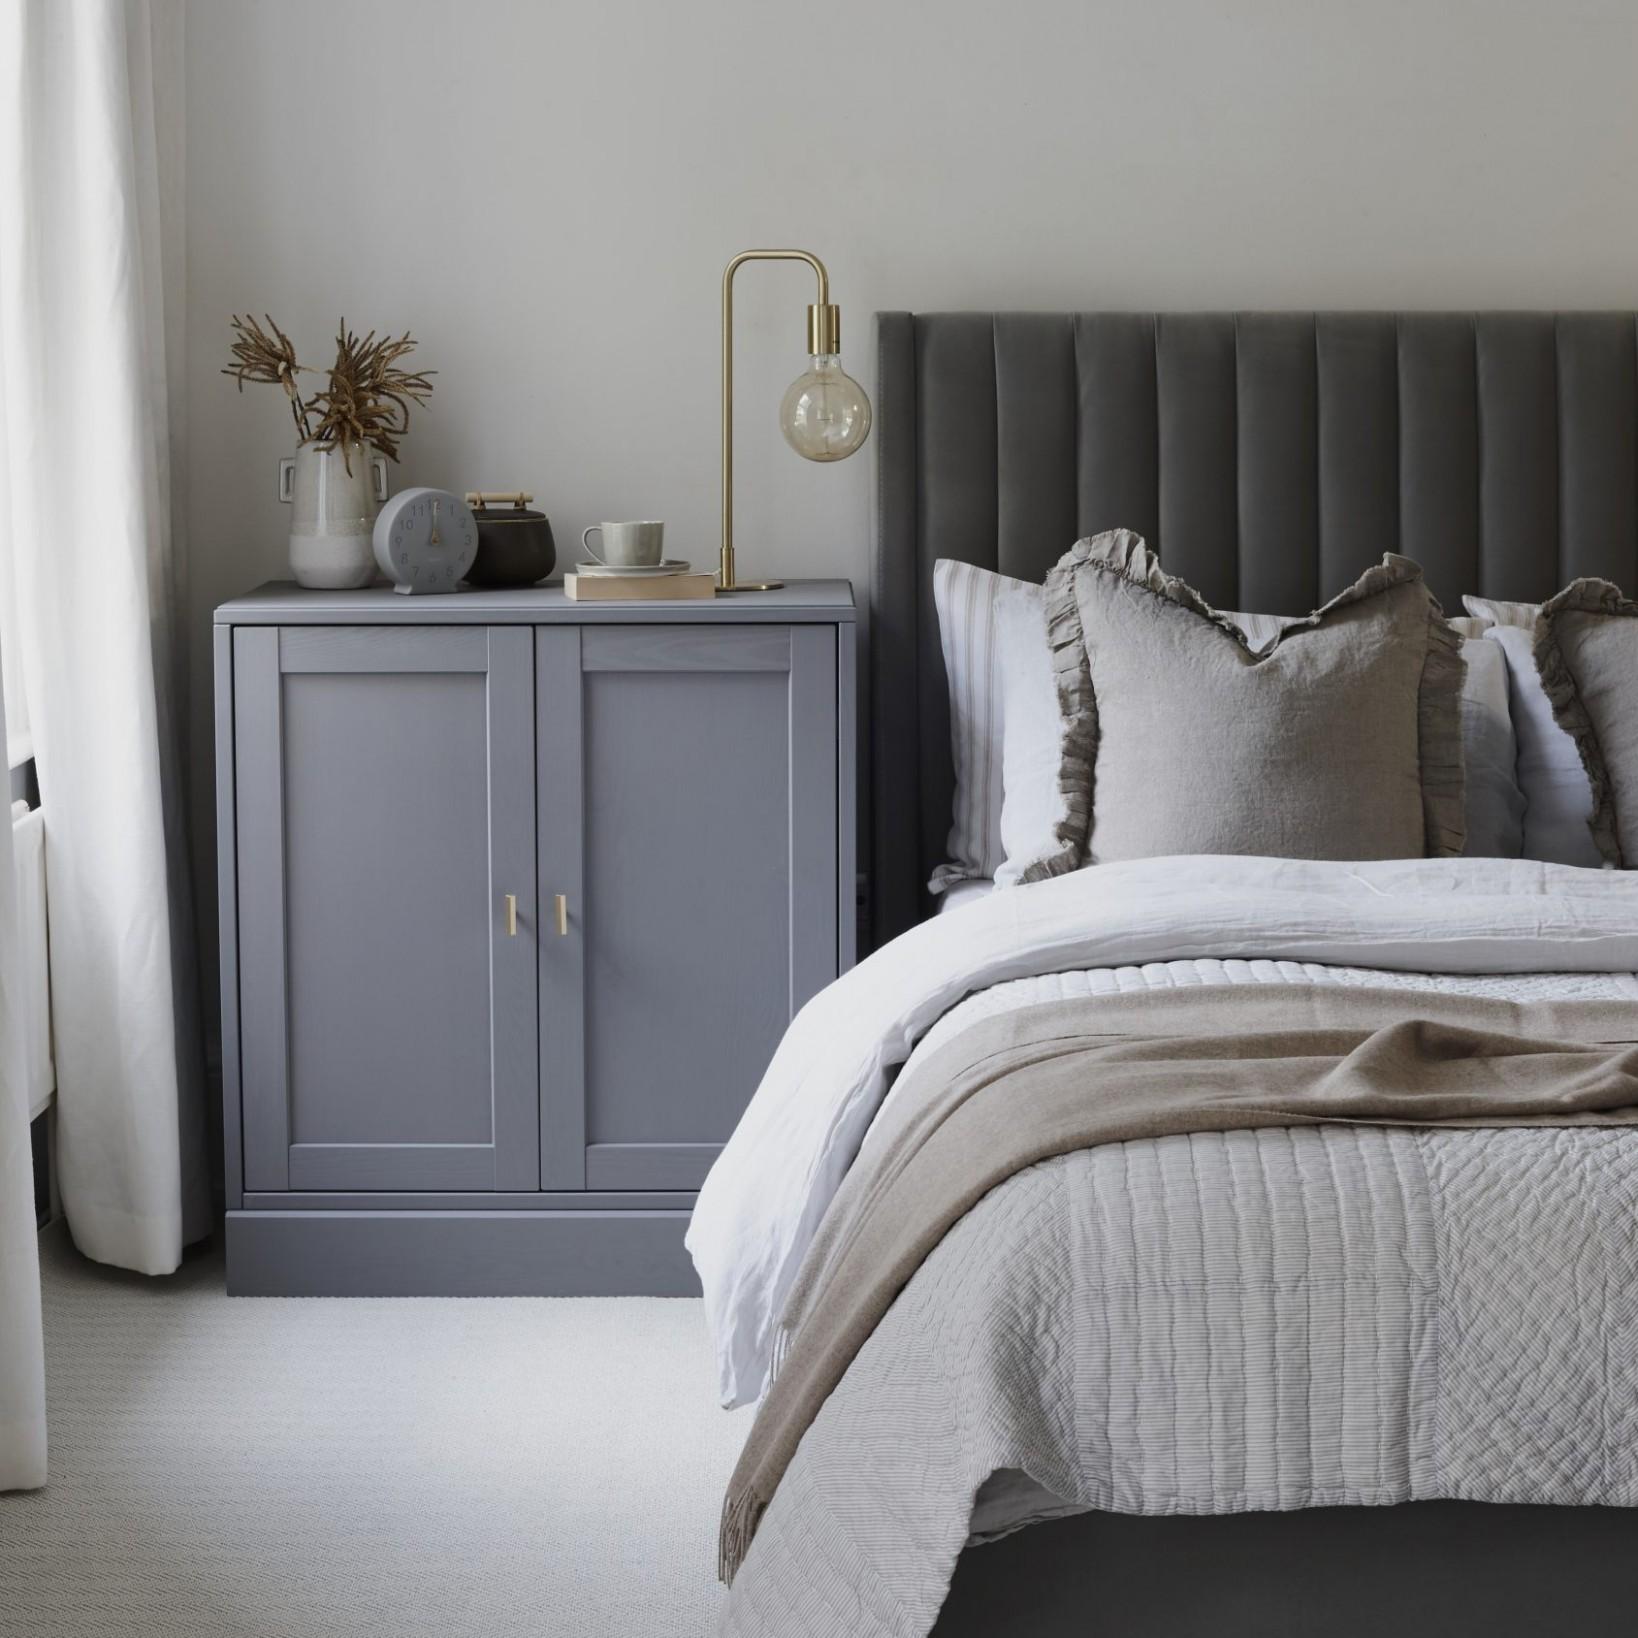 Grey bedroom ideas – grey bedroom decorating – grey colour scheme - Bedroom Ideas Images